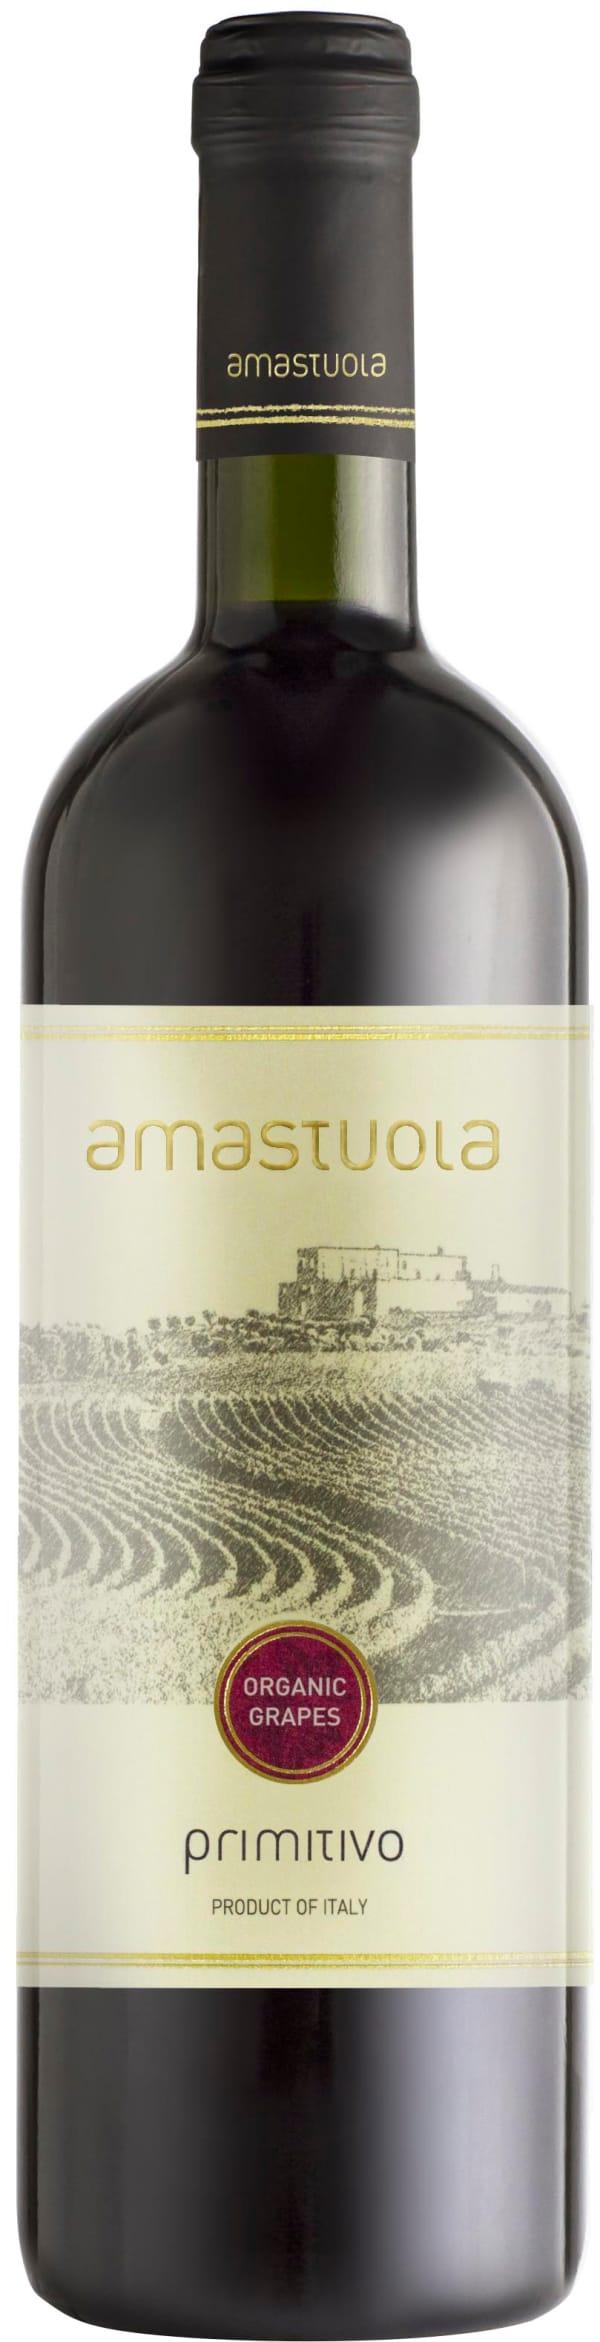 Amastuola Primitivo Organic 2016